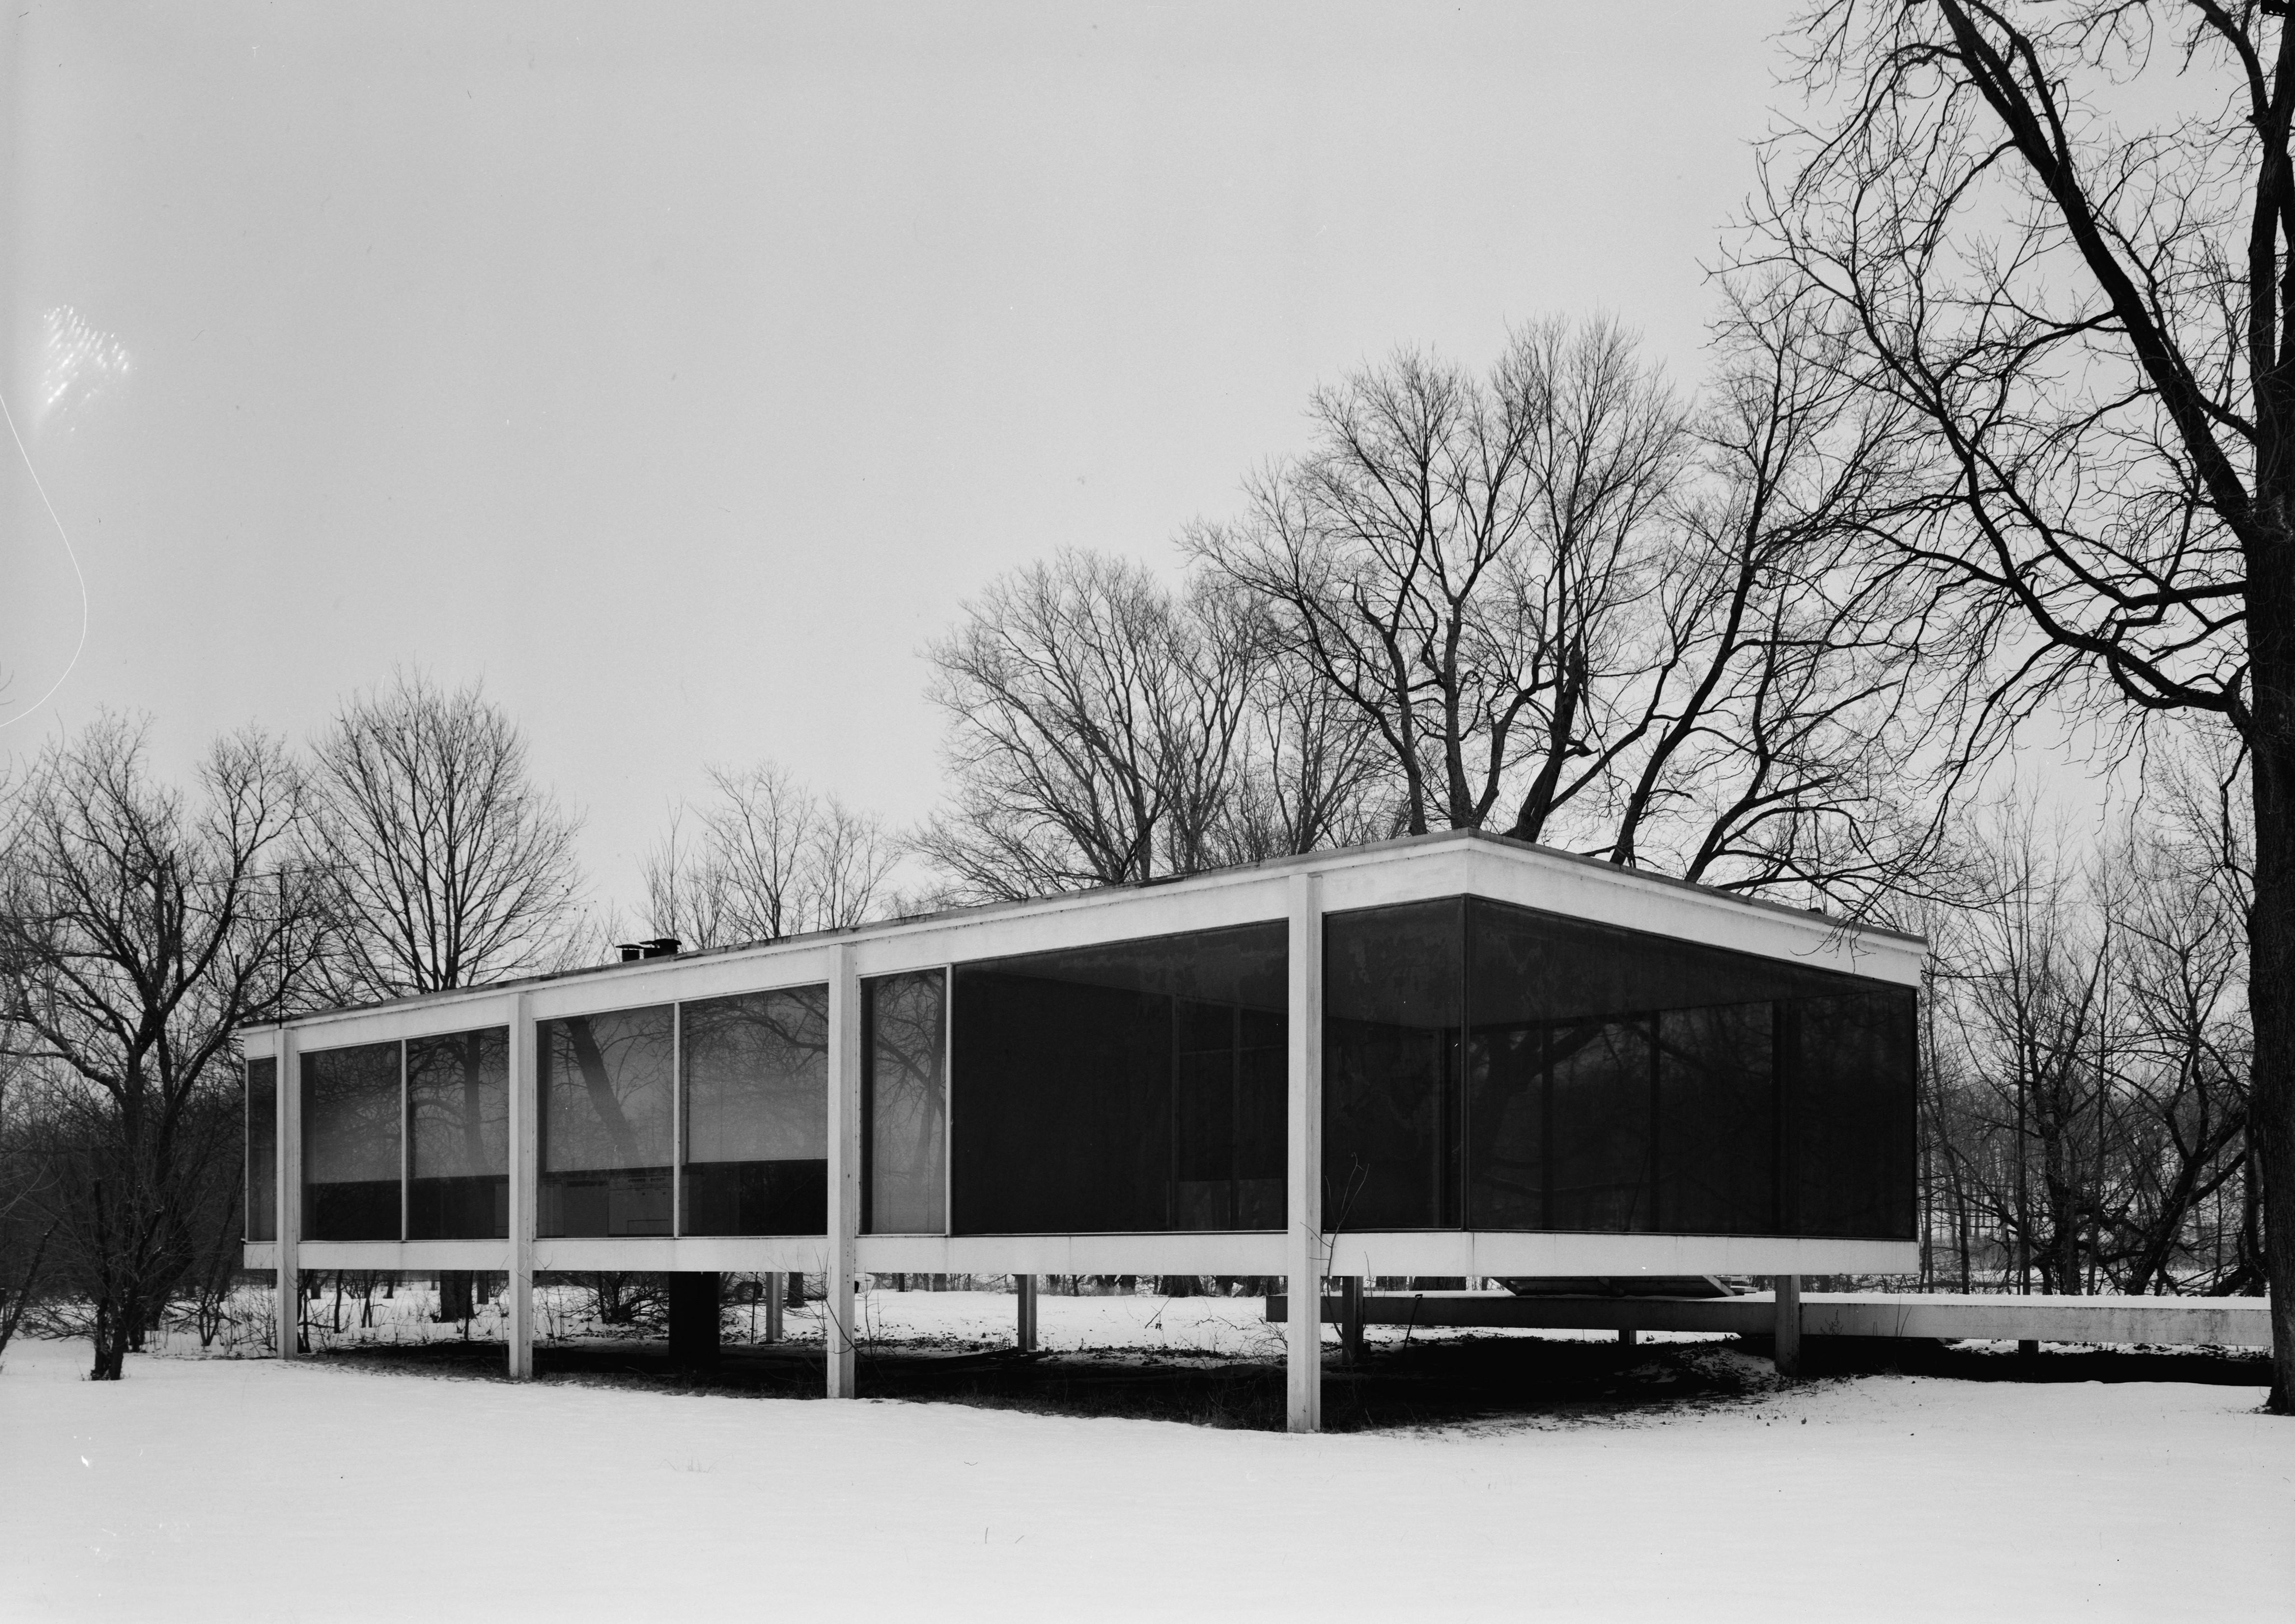 Contemporary Architecture III Ludwig Mies van der Rohe  diStRito47